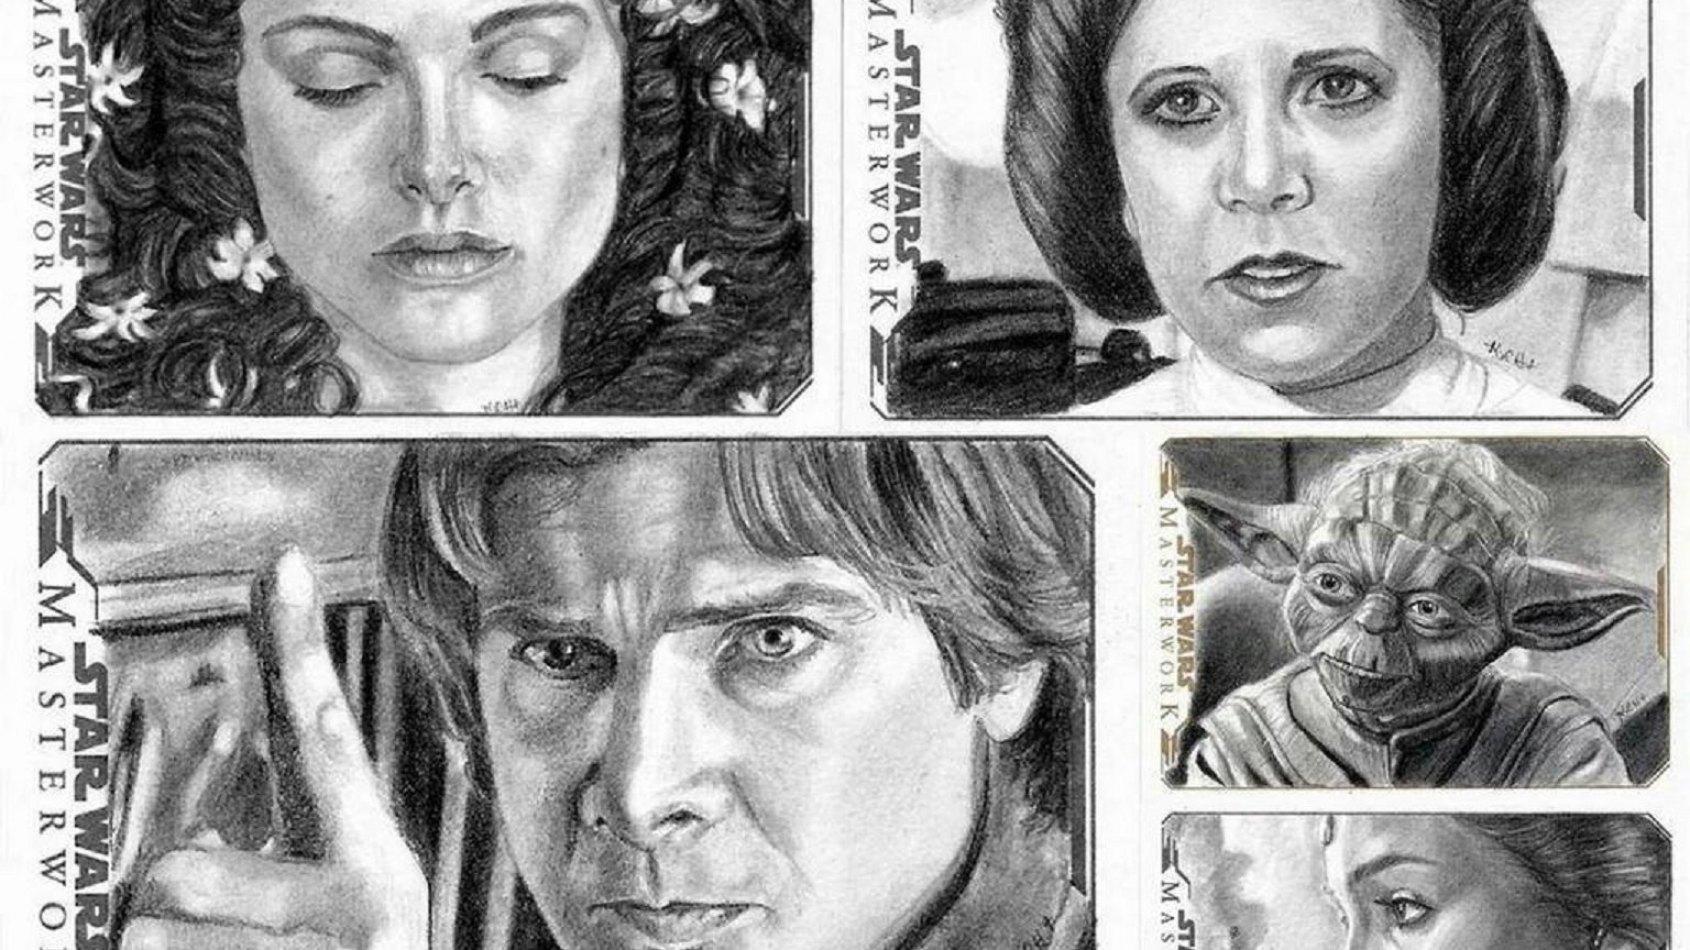 Quand Star Wars inspire les artistes